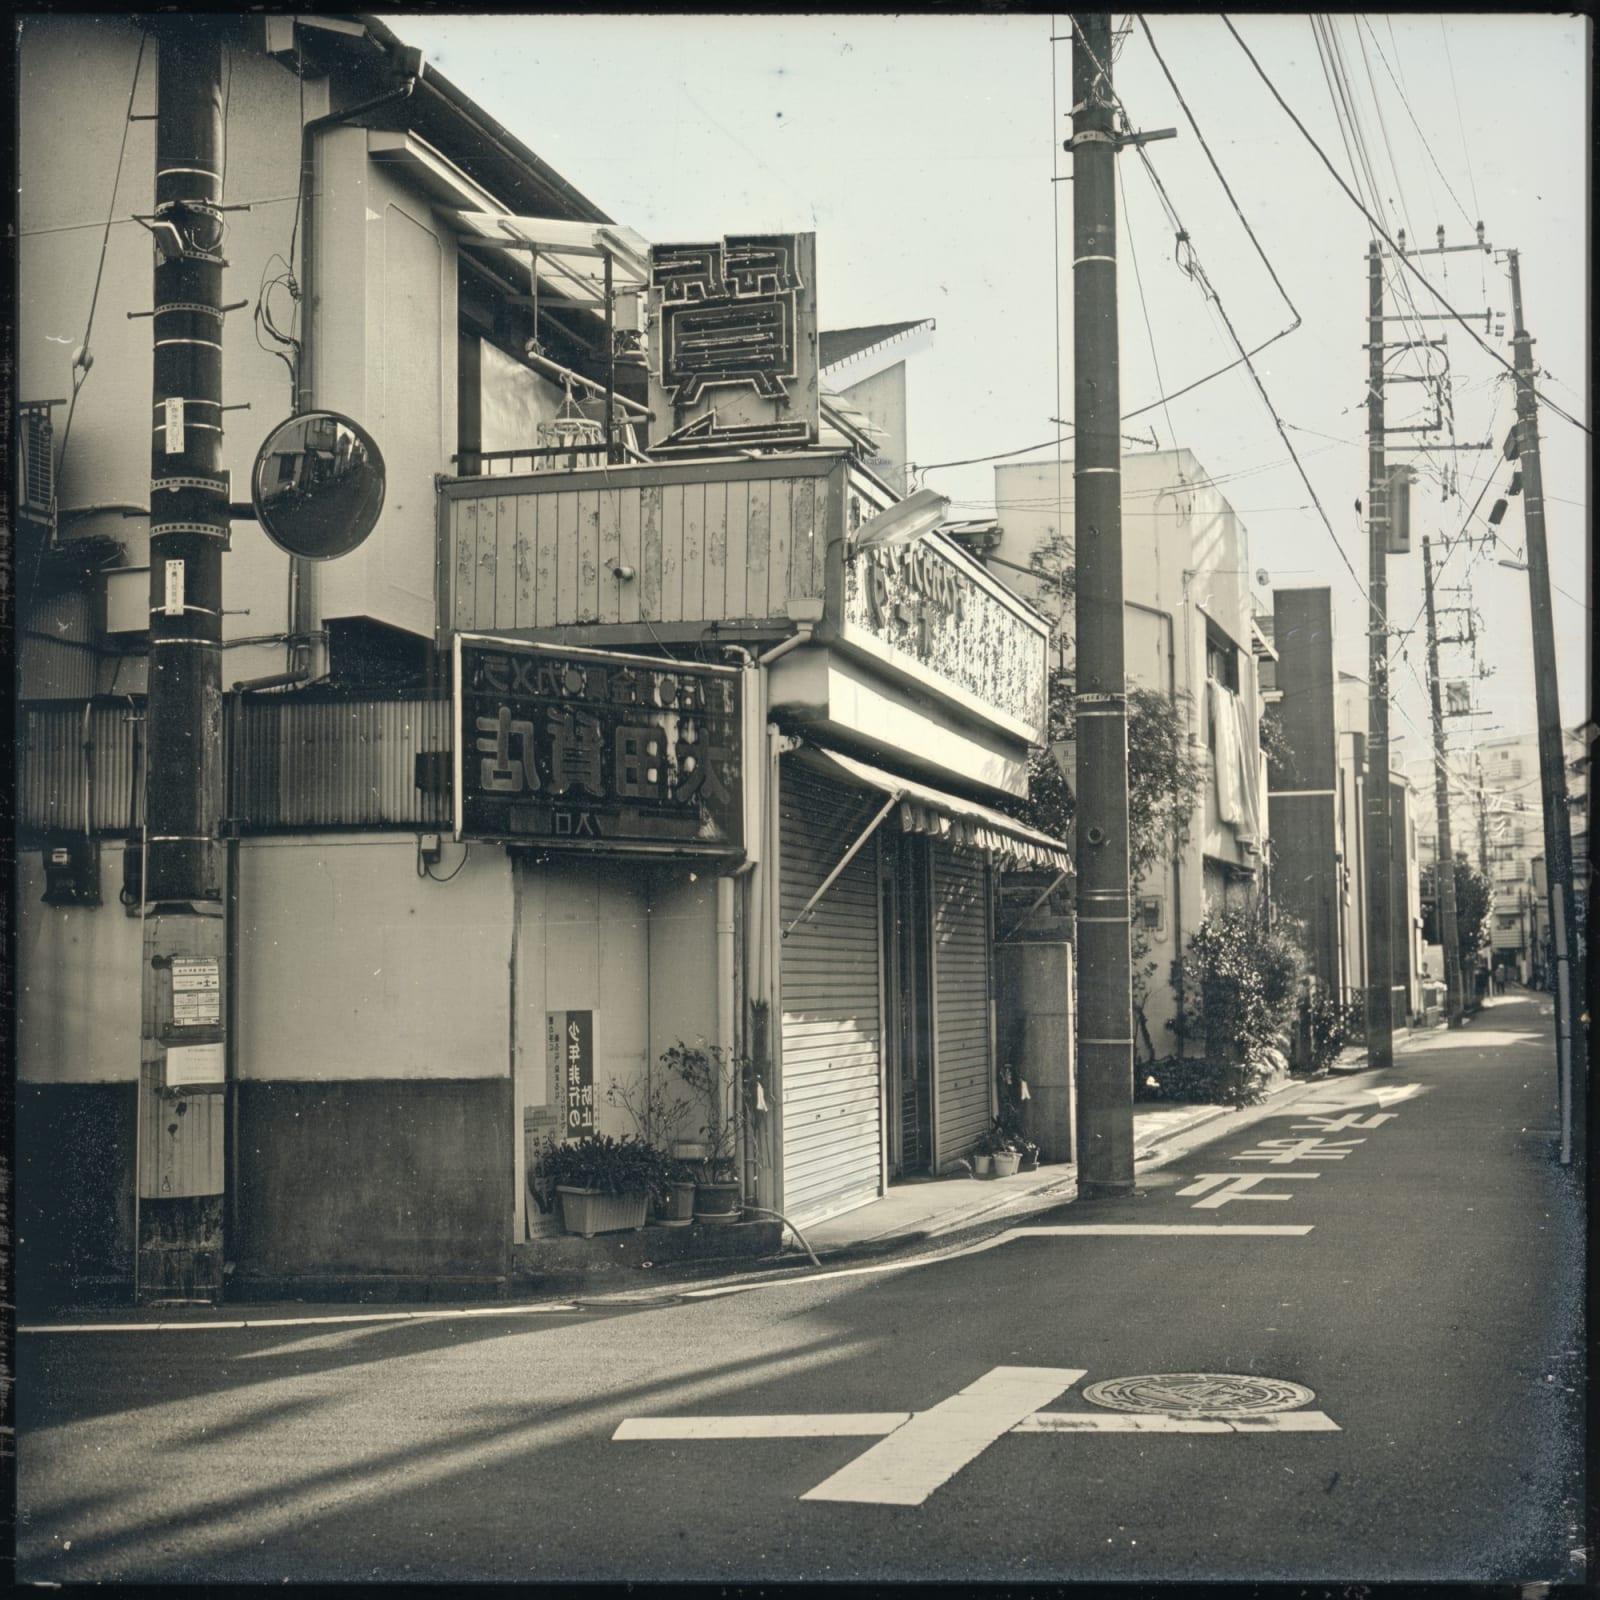 Takashi Arai, Pawn Shop, Nakamura, December 29, 2016